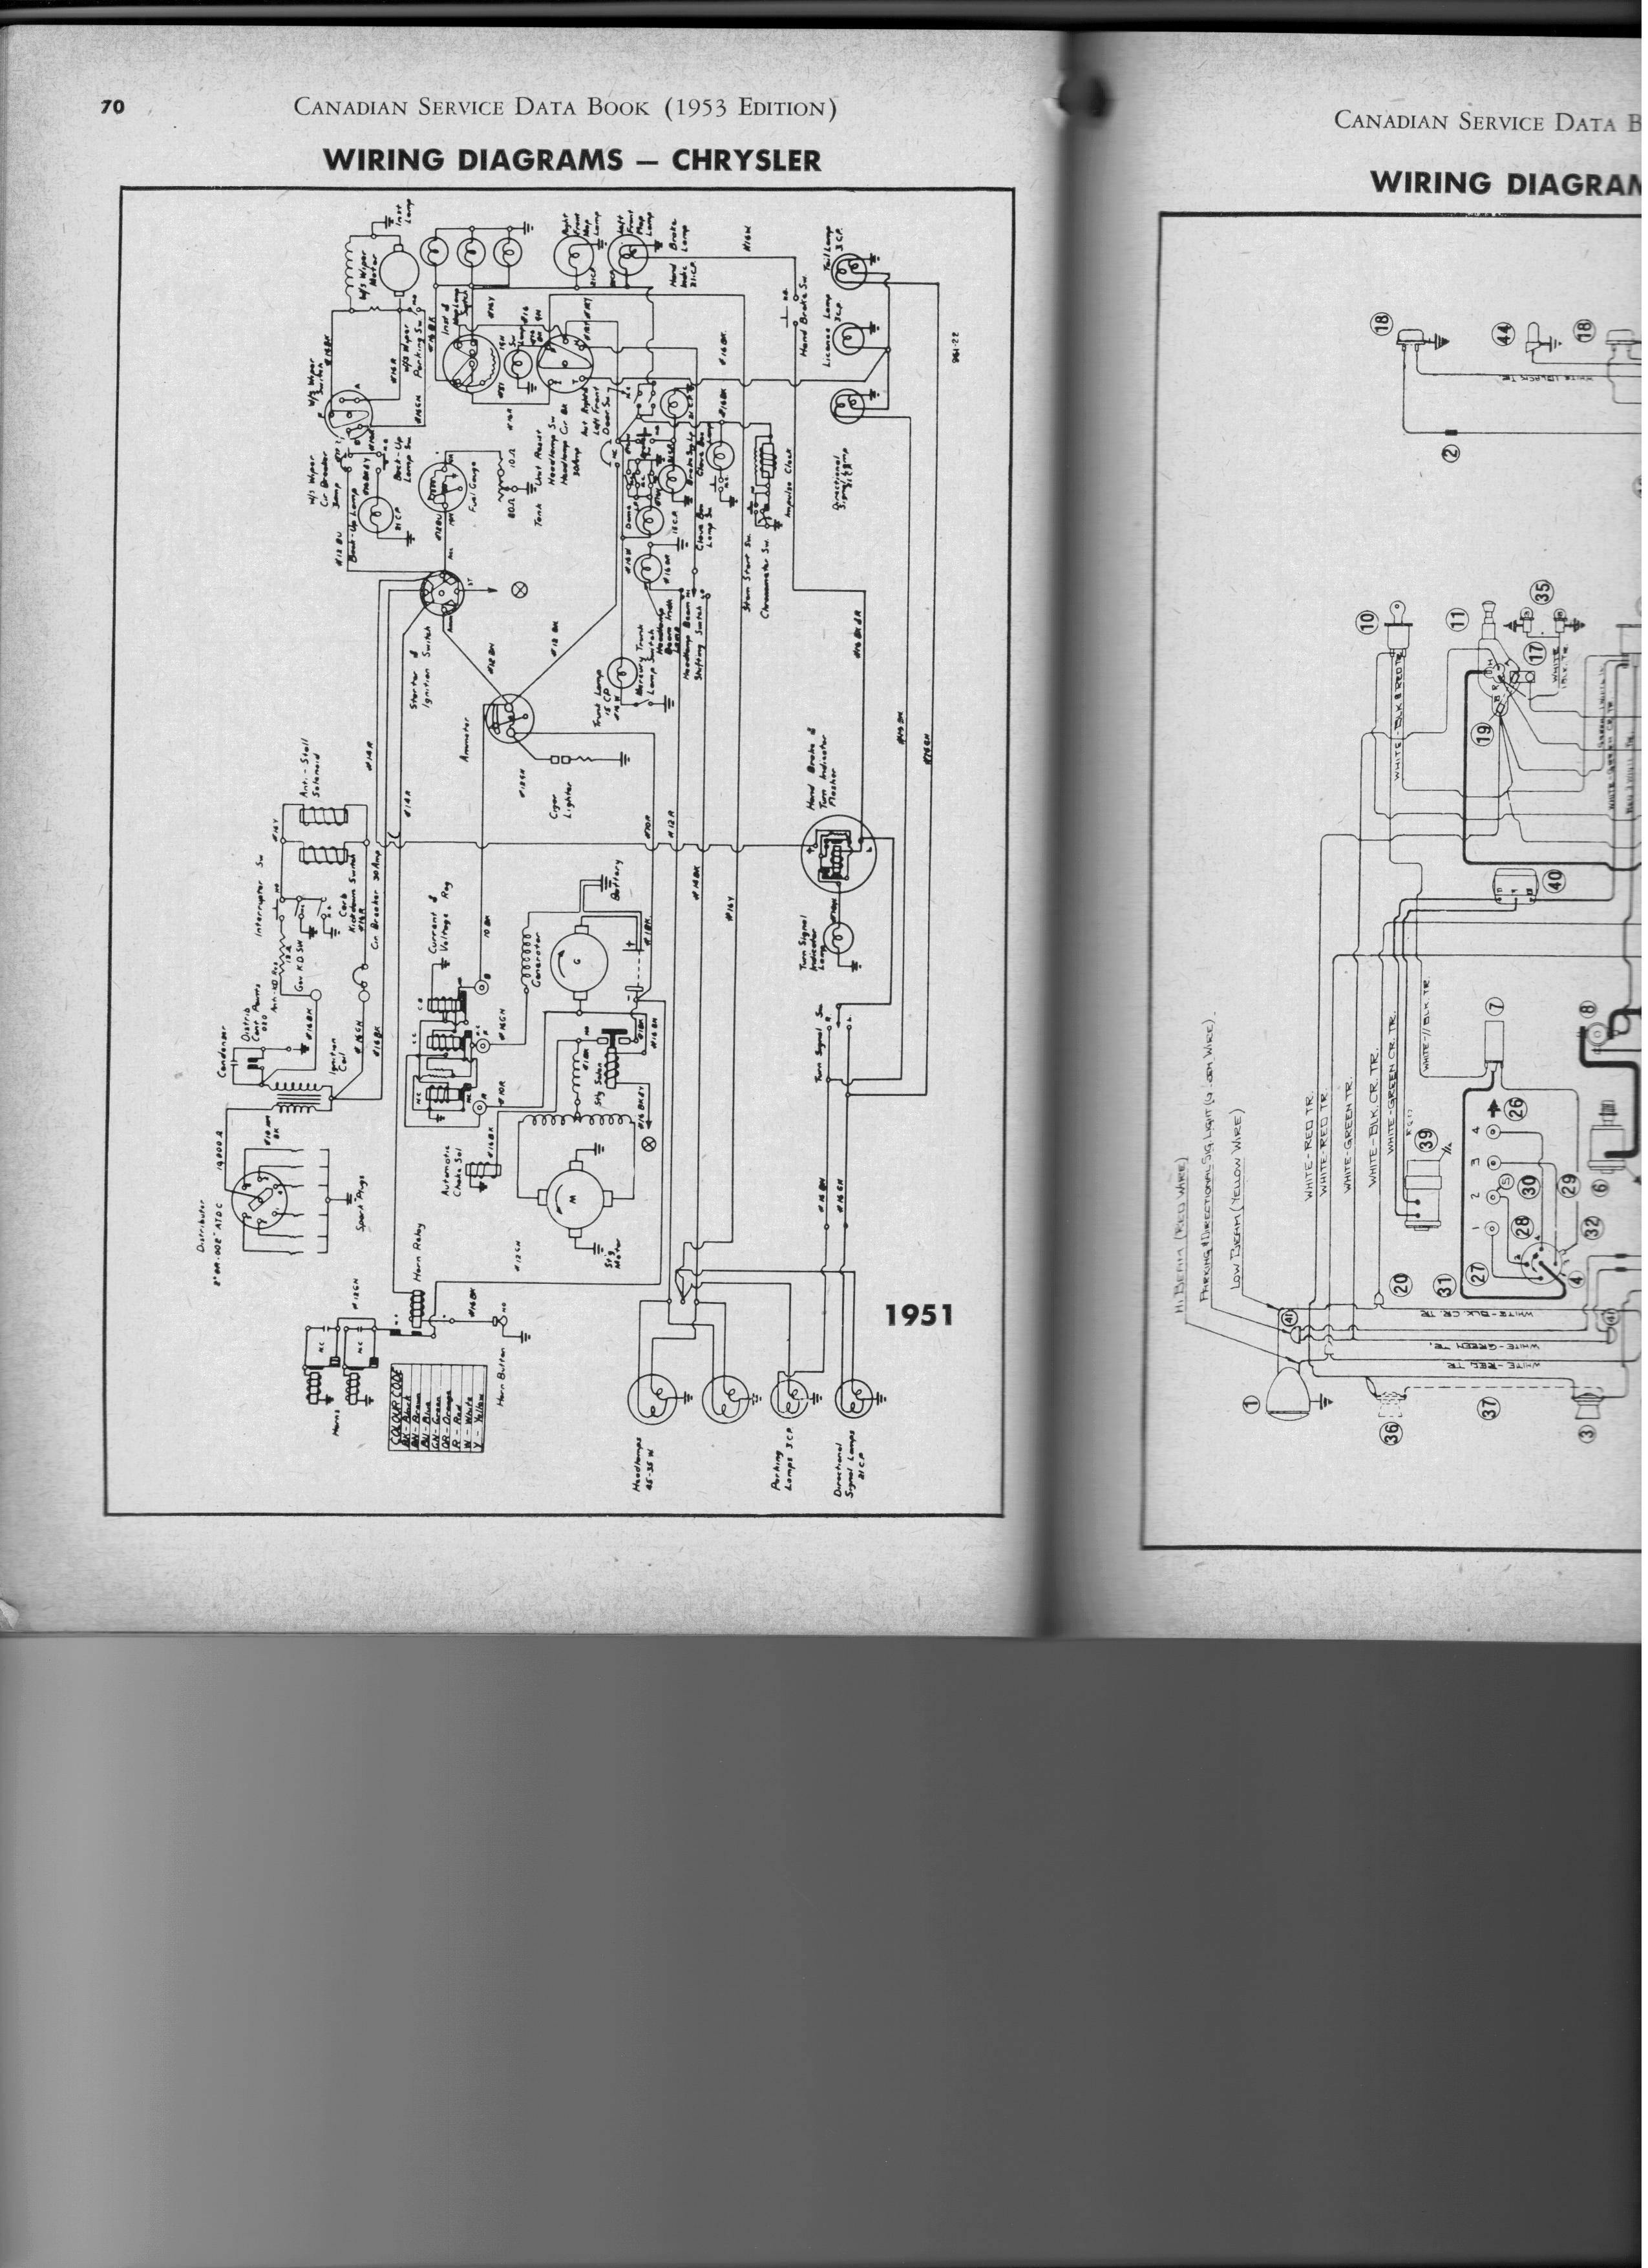 51 Chrysler wiring diagram 002.jpg